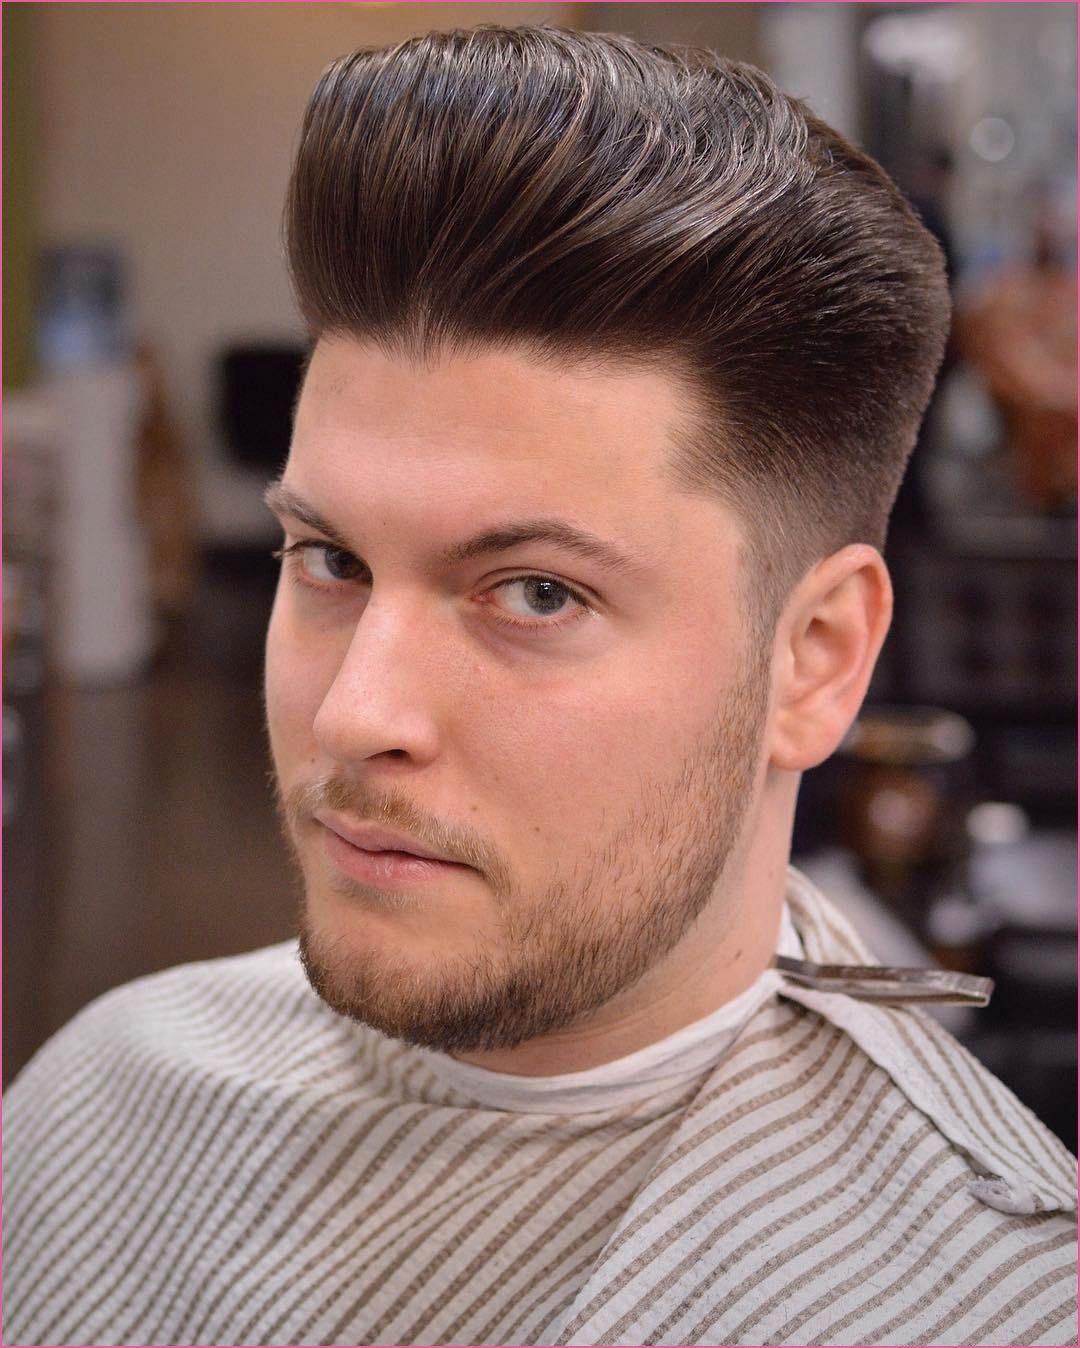 Penteado Da Tonsura Nail Effect In 2020 Hairstyles For Round Faces Round Face Men Medium Hair Styles